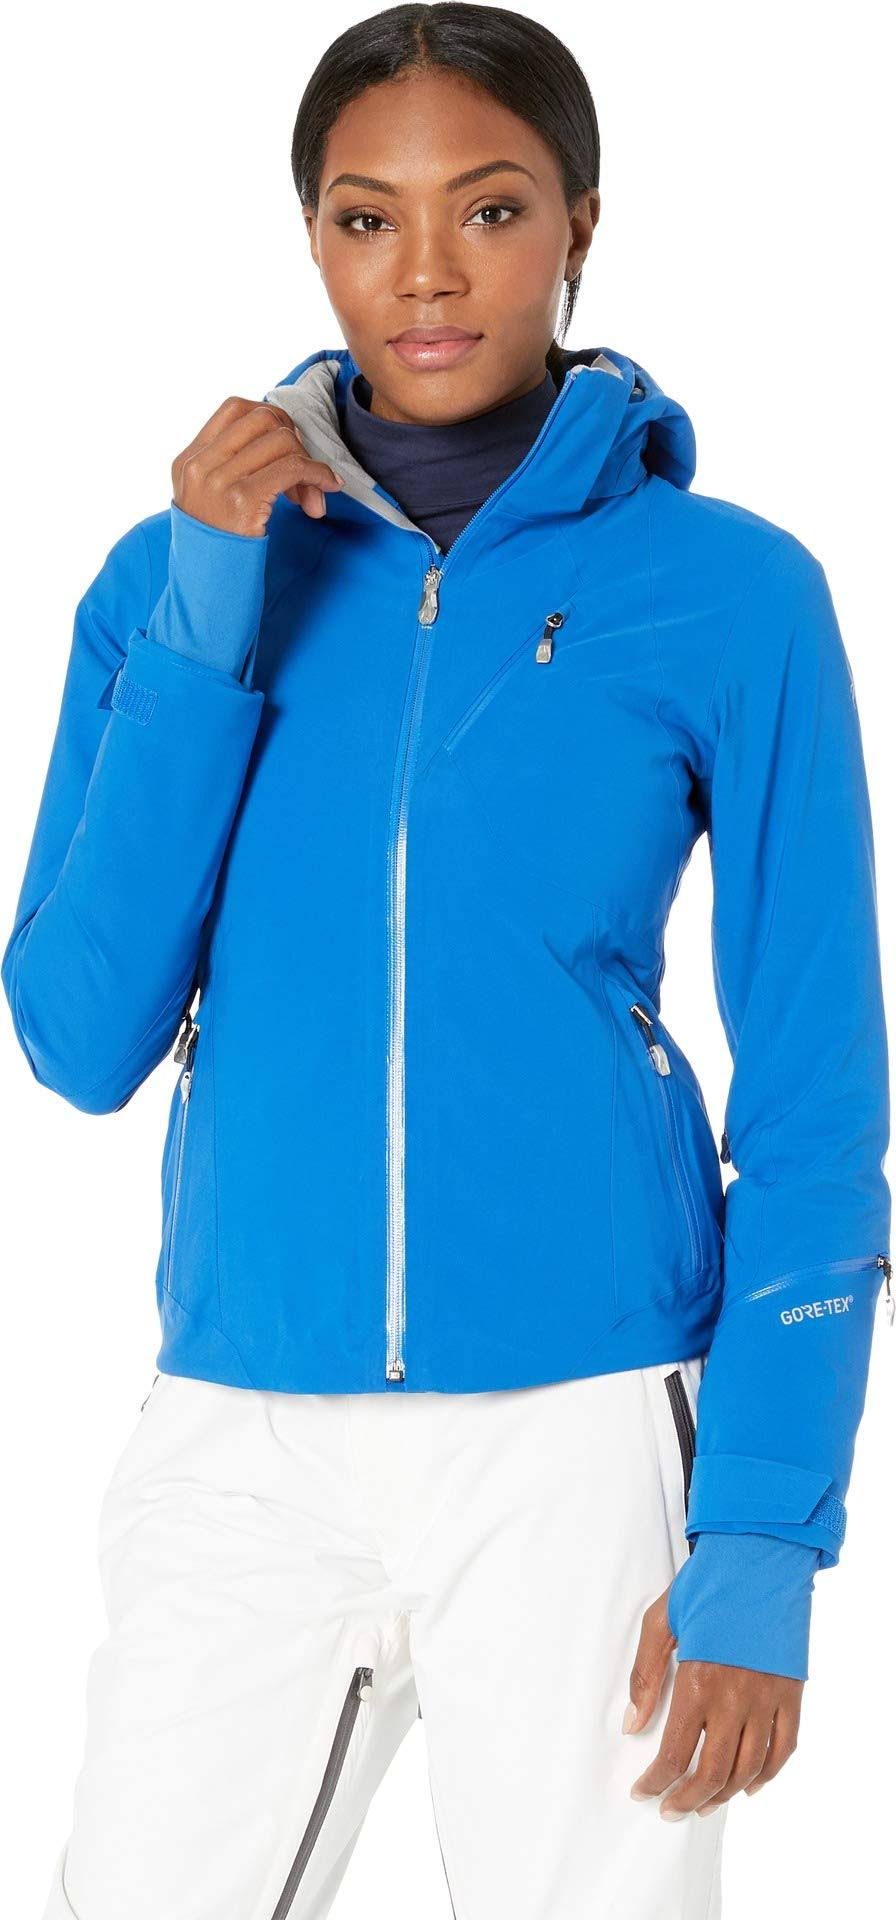 Geneva Spyder Mujer Mar 6 Turquía Jacket De Abrigo Turco 1qCZWTSZ